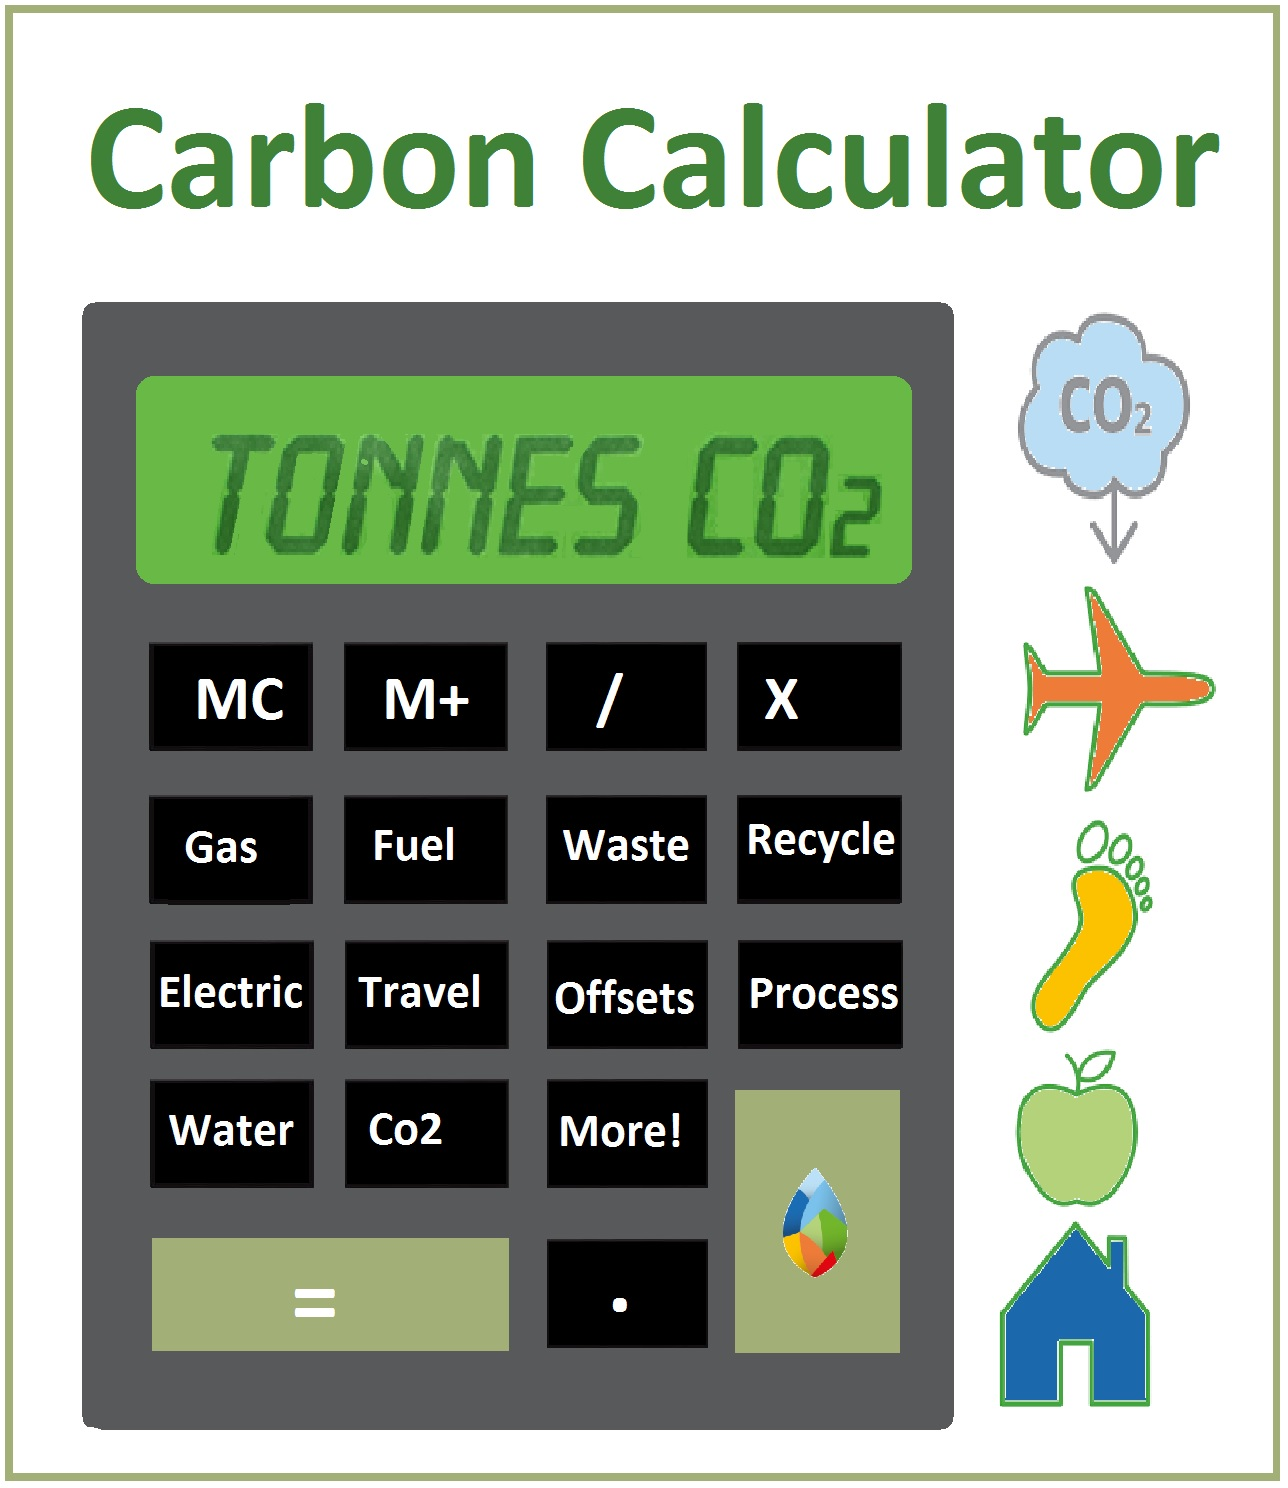 Carbon Calculator Graphic